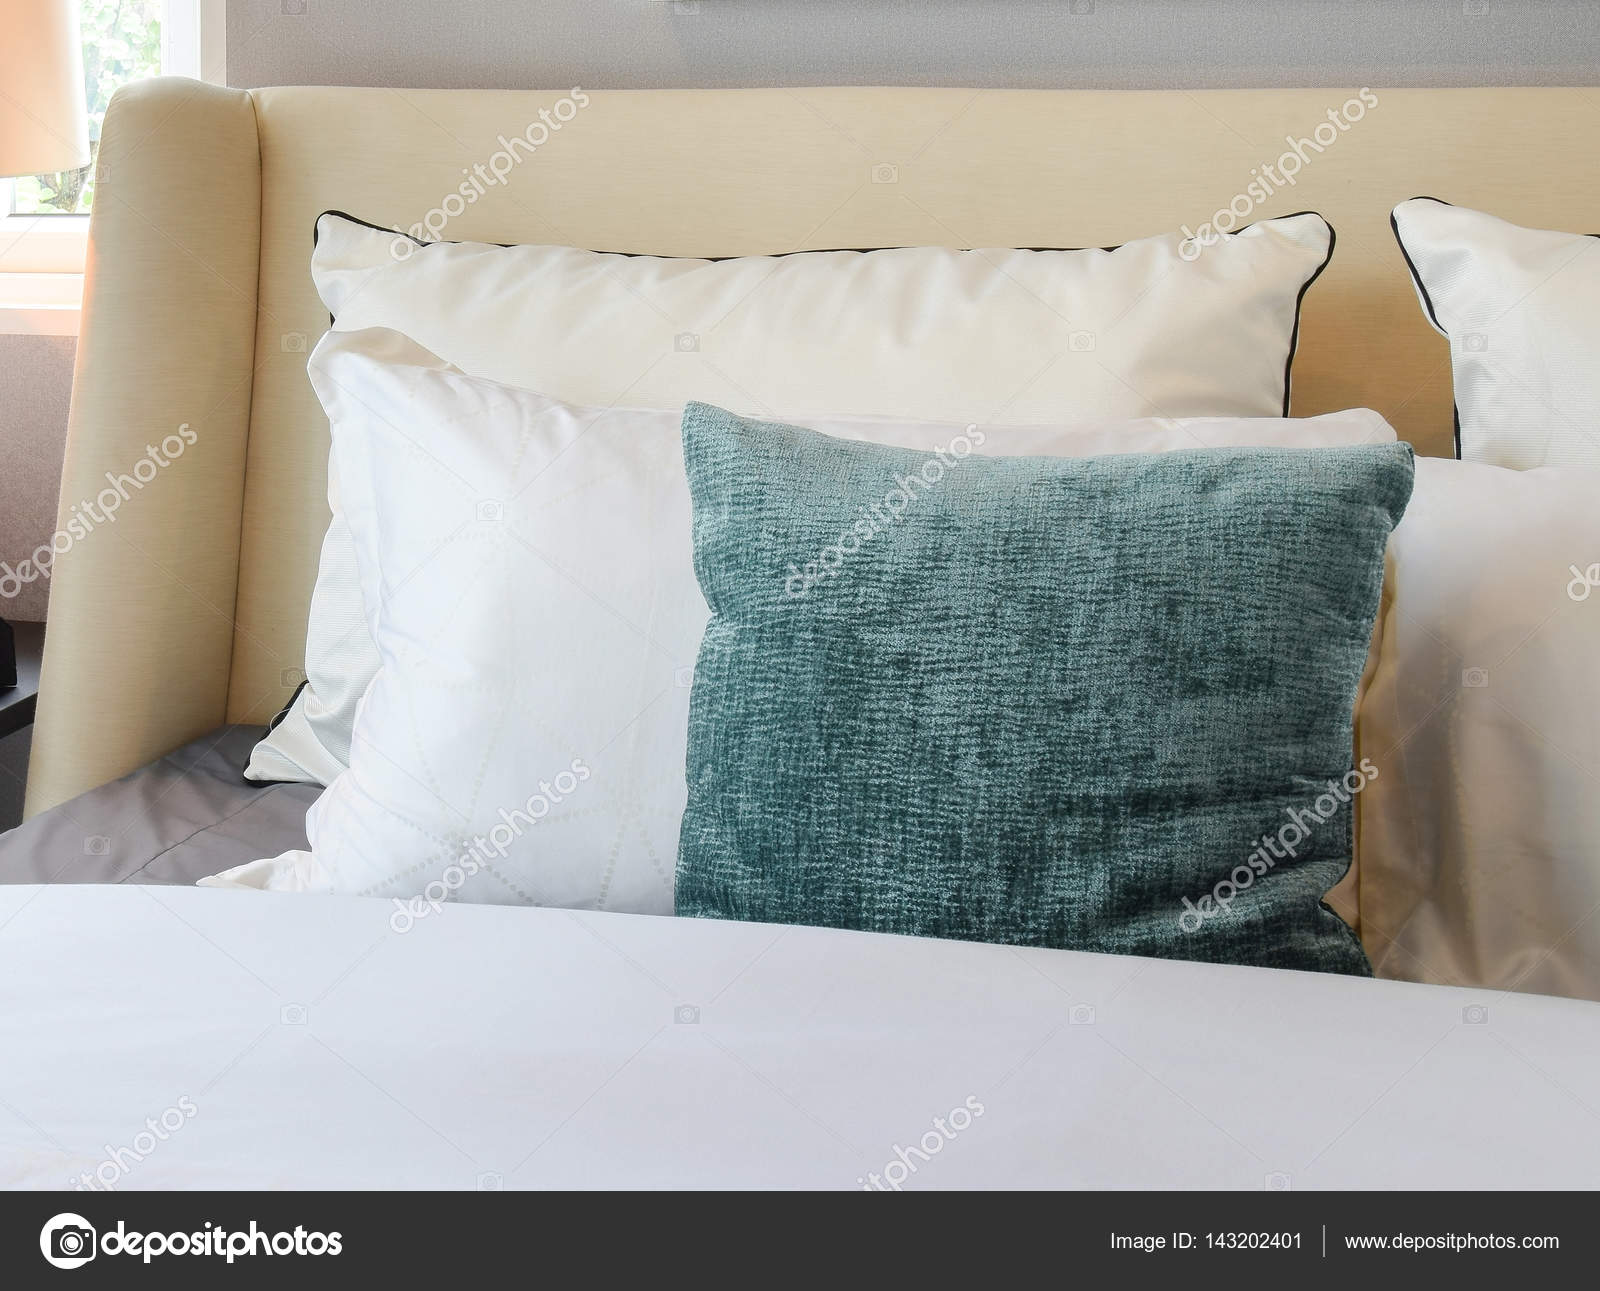 Slaapkamer Groen Wit : Slaapkamer interieurontwerp met witte en groene kussens op bed wit